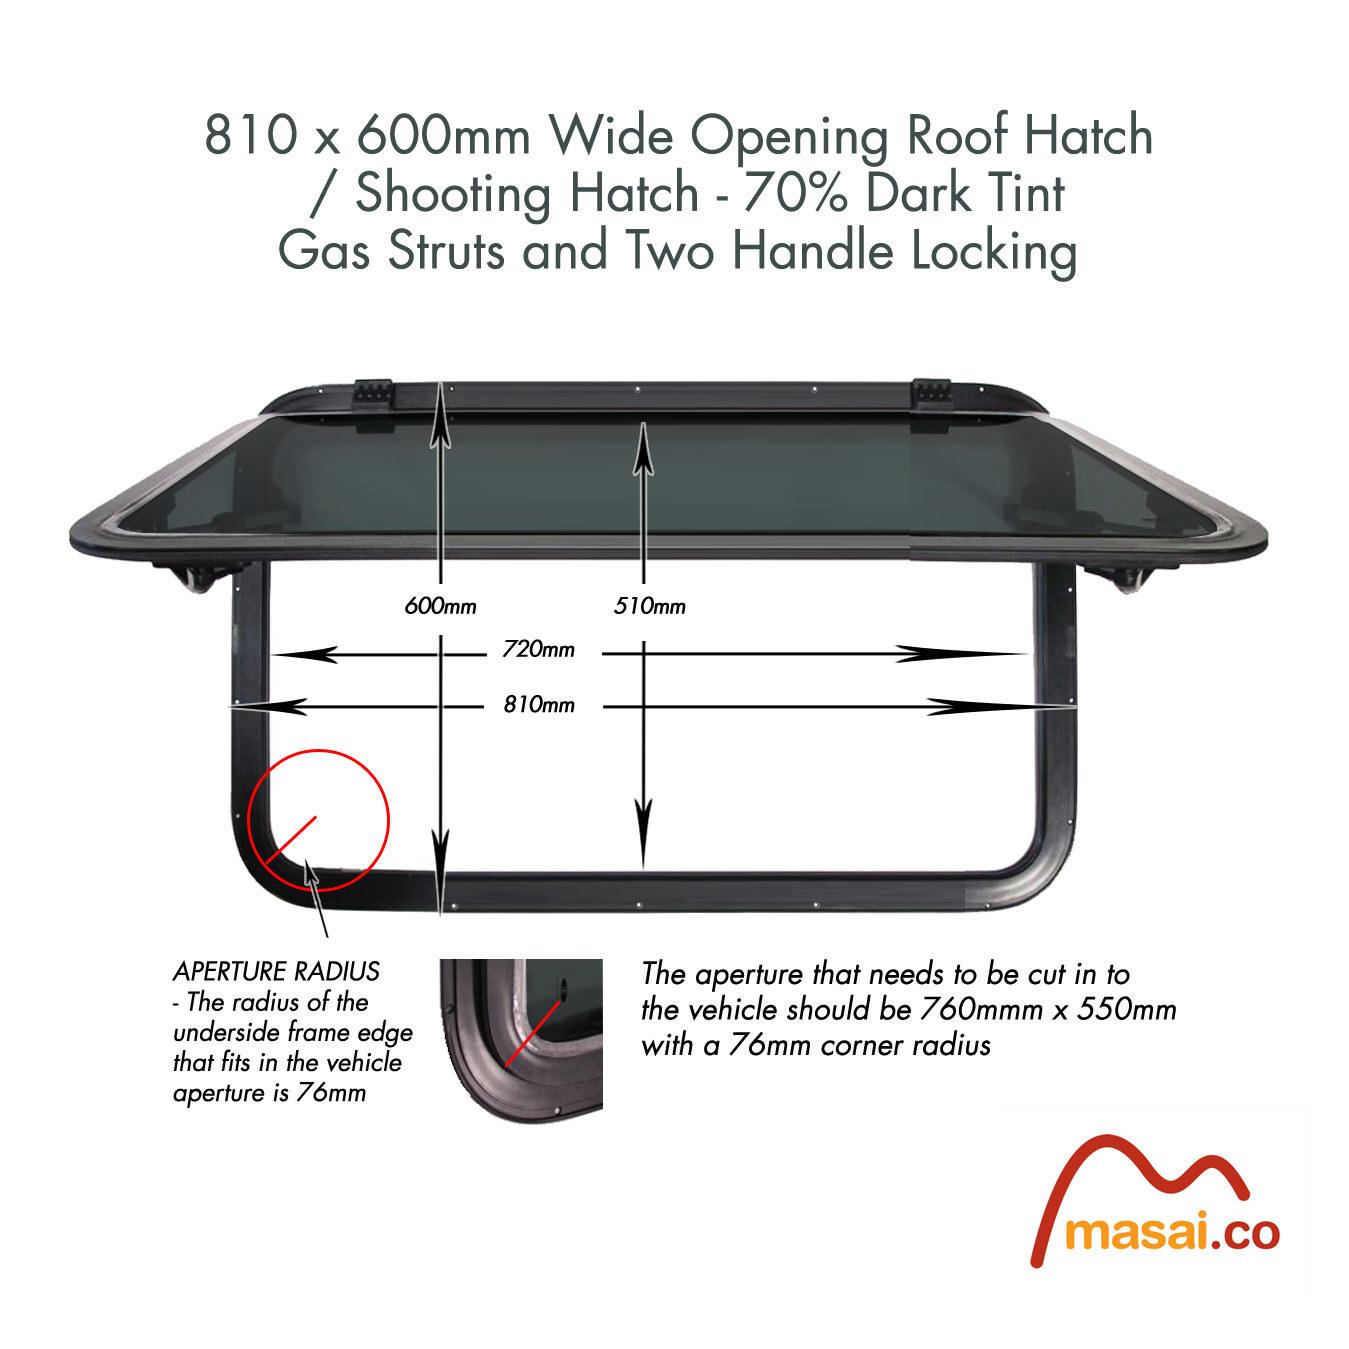 Wide Opening Roof Window / Shooting Hatch / Deck Hatch - 810 x 600 mm DEF810x600